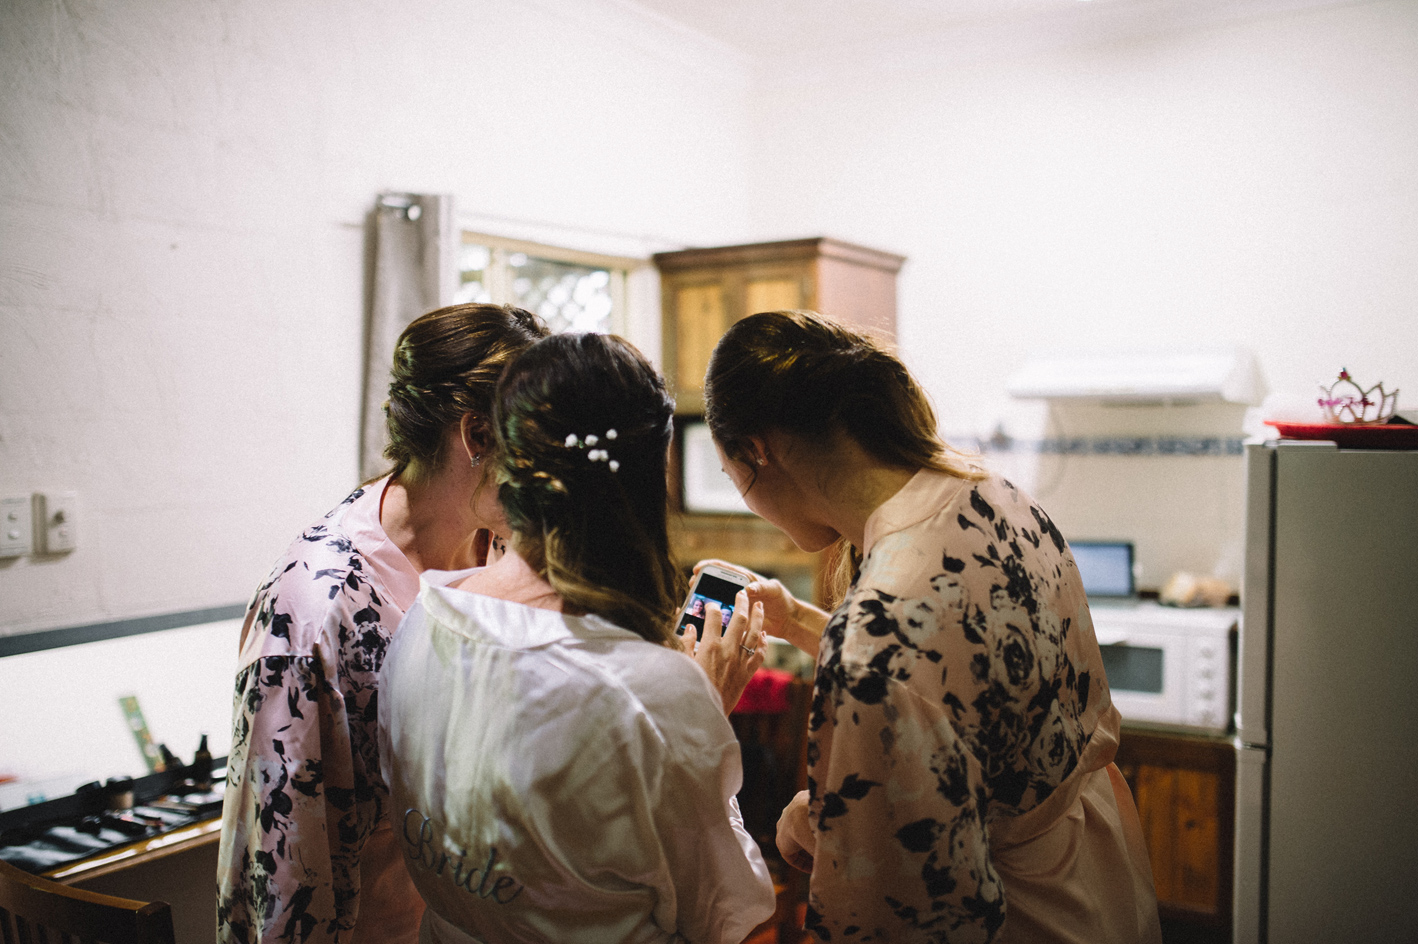 004-michelle-reagan-mount-tamborine-wedding-sophie-baker-photography